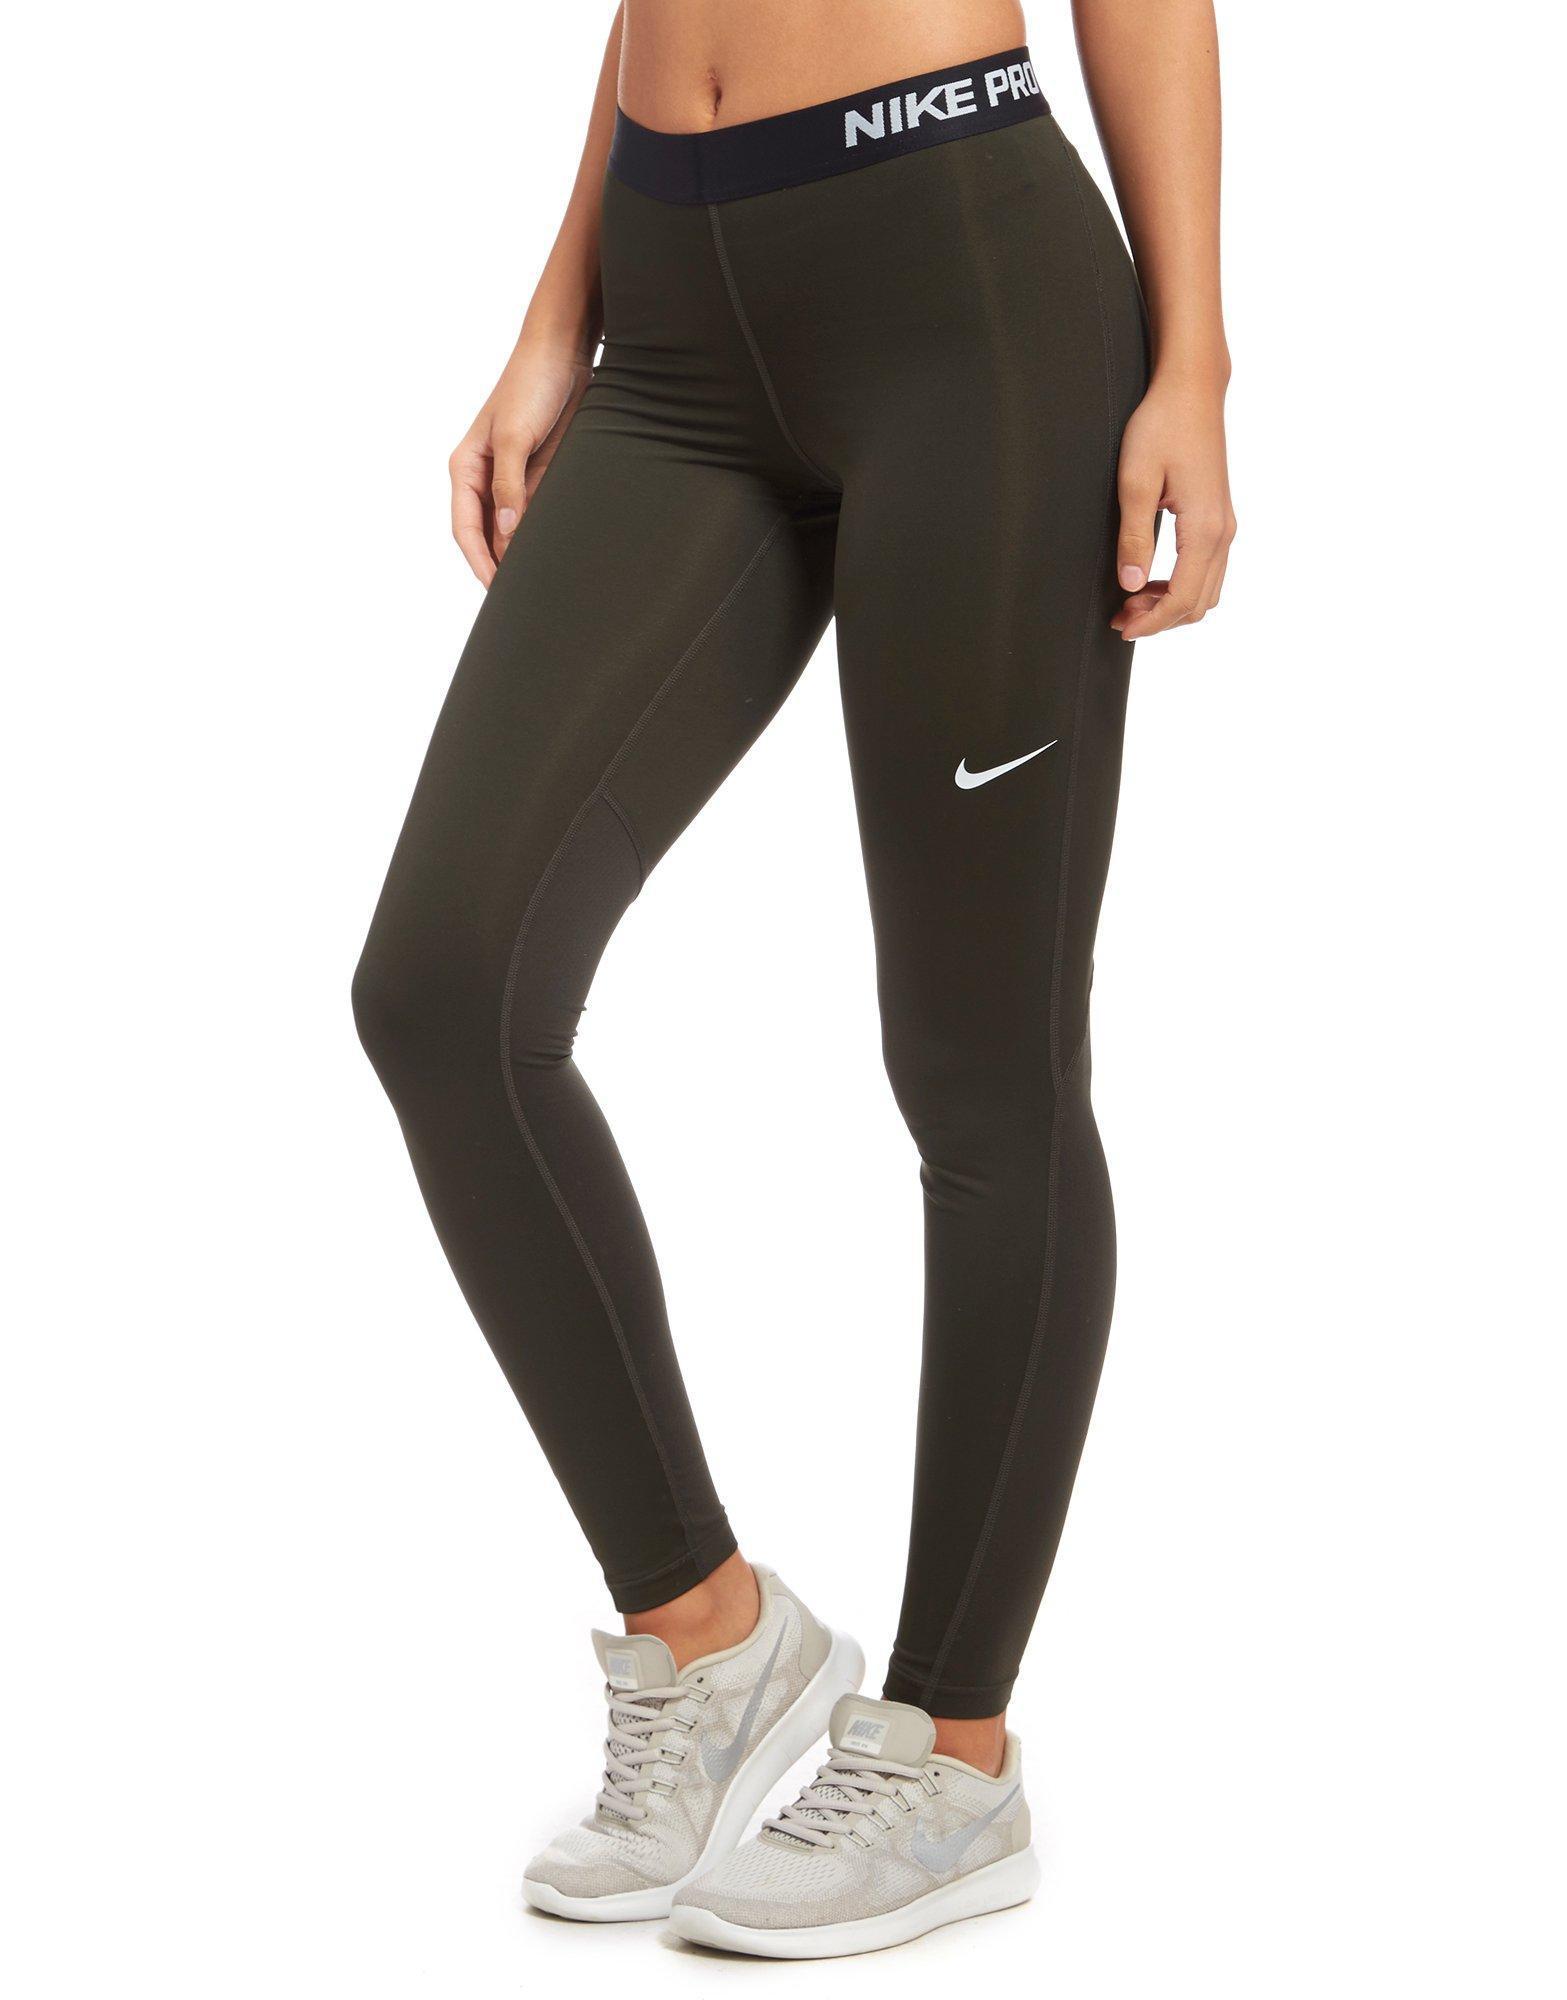 60c9b13f9c027 Lyst - Nike Pro Tight Leggings in Green